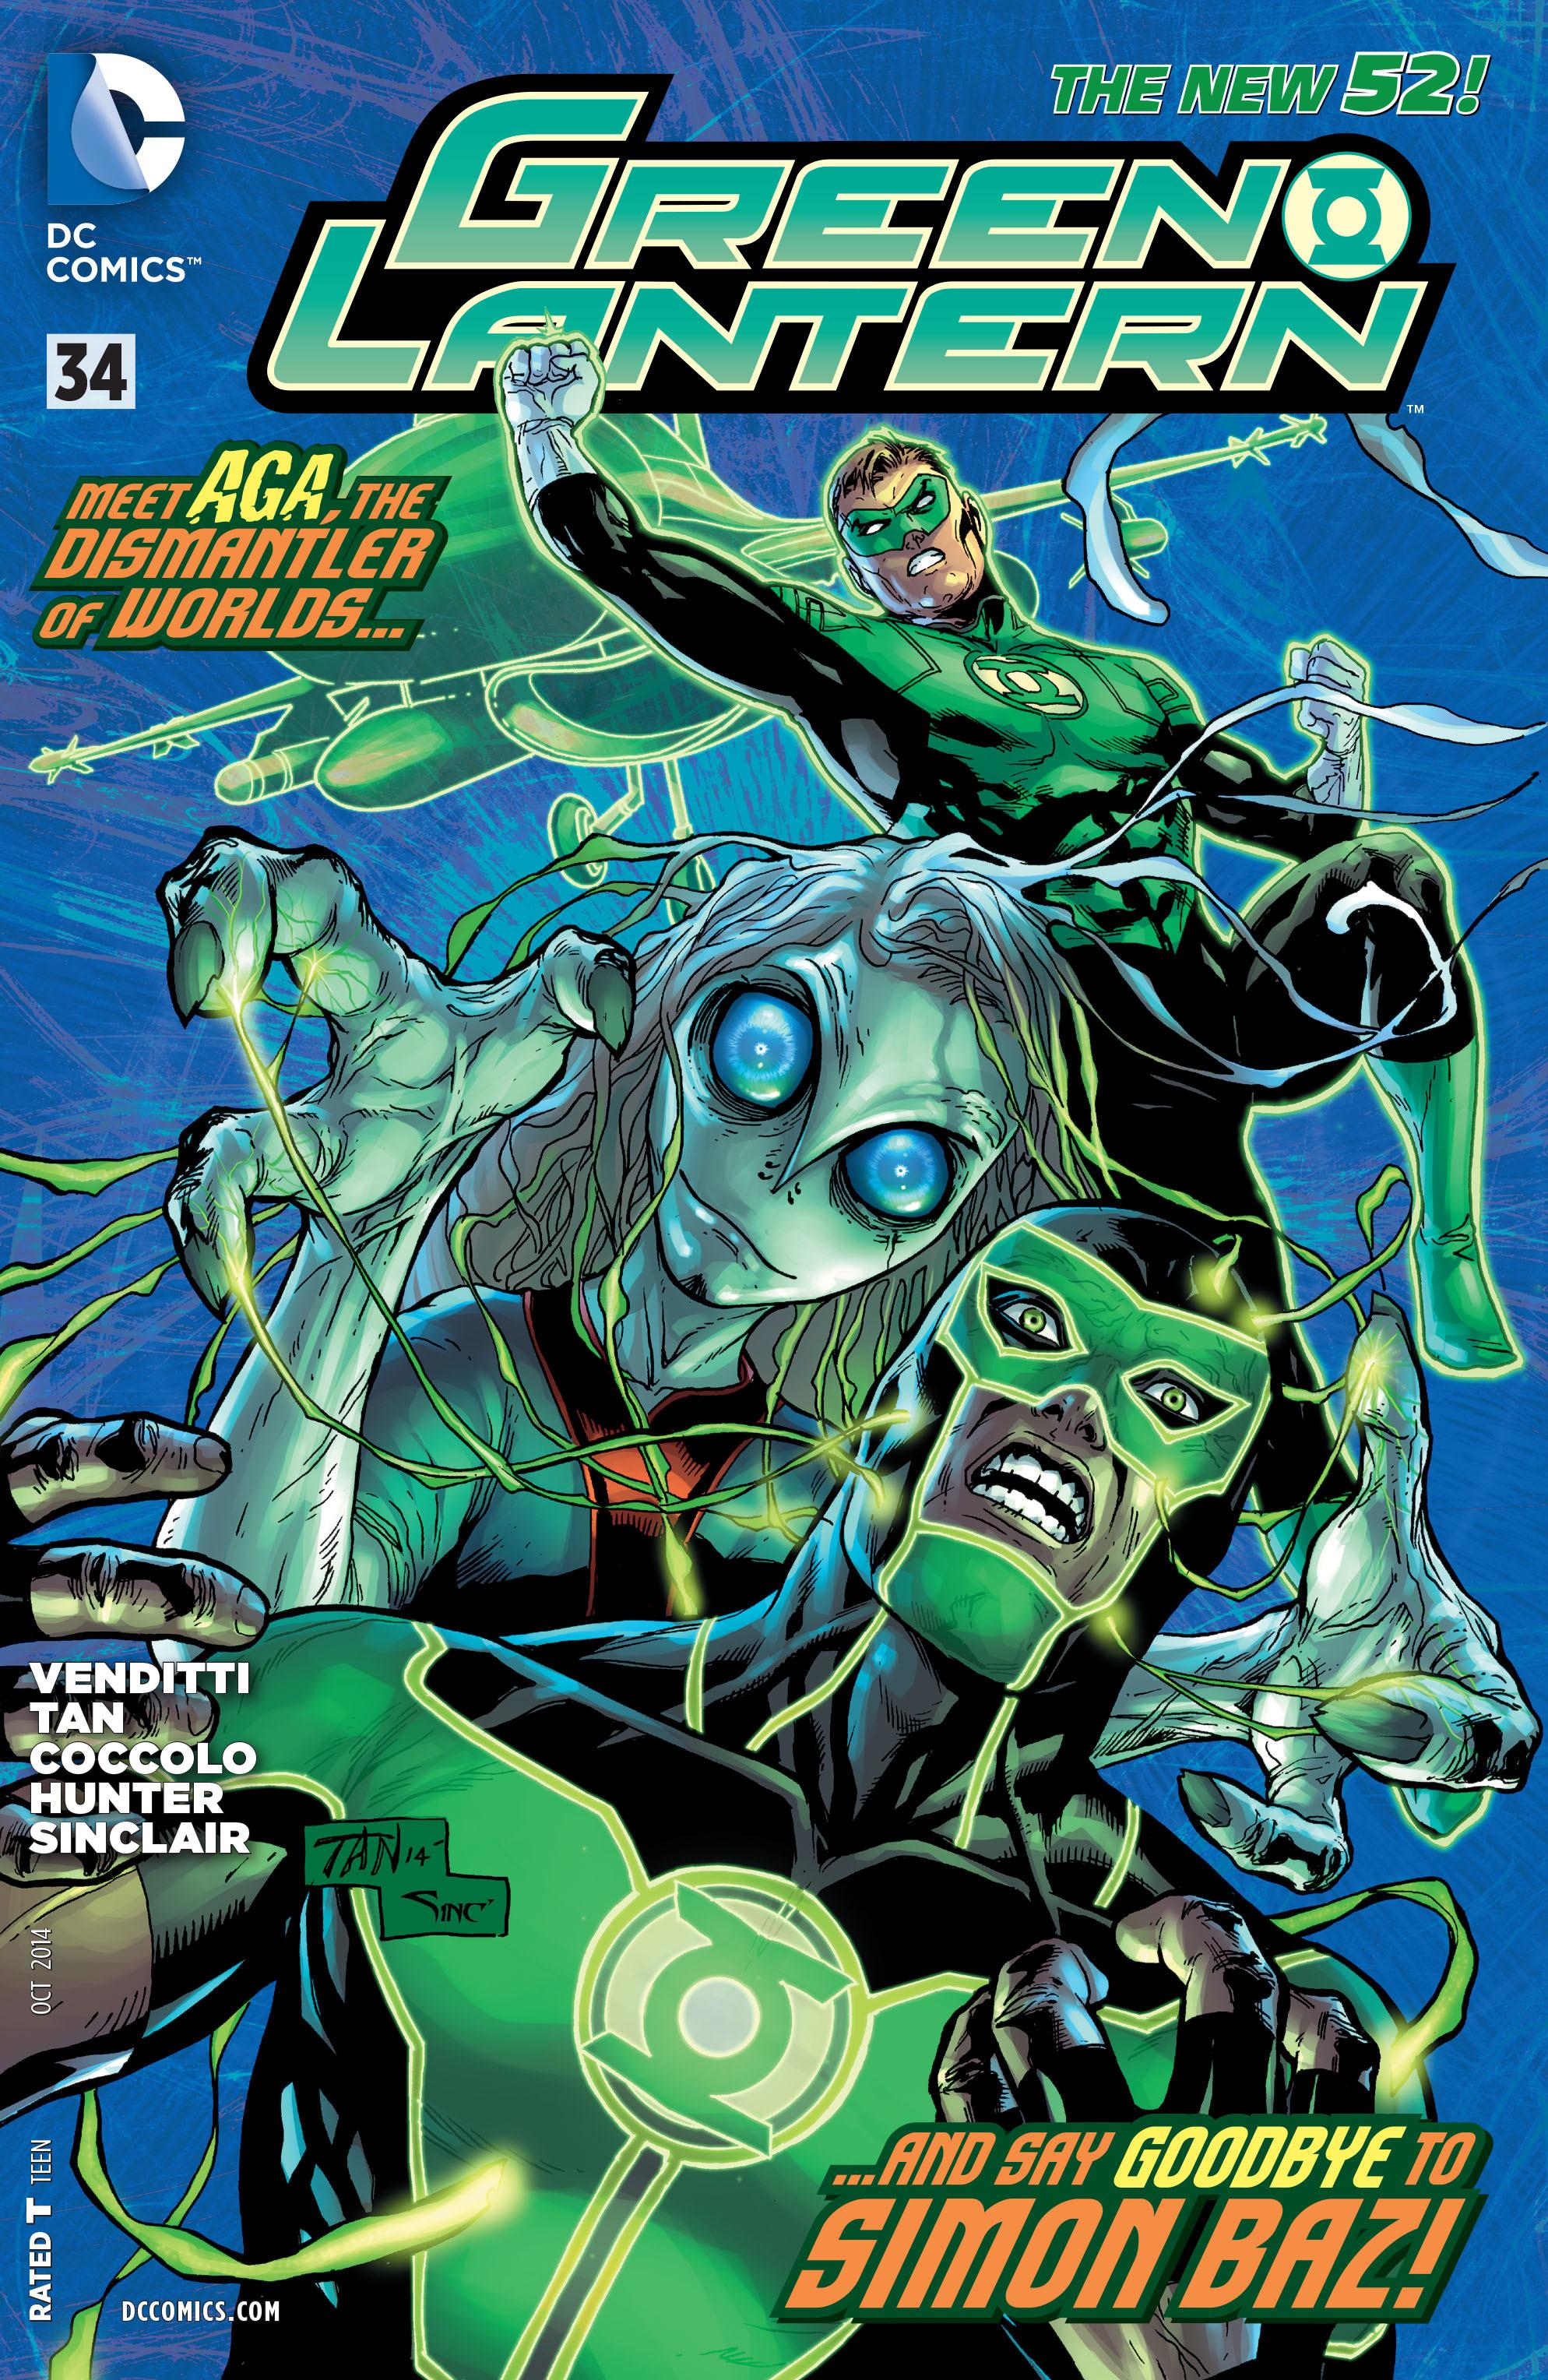 GREEN LANTERN #34 - cover